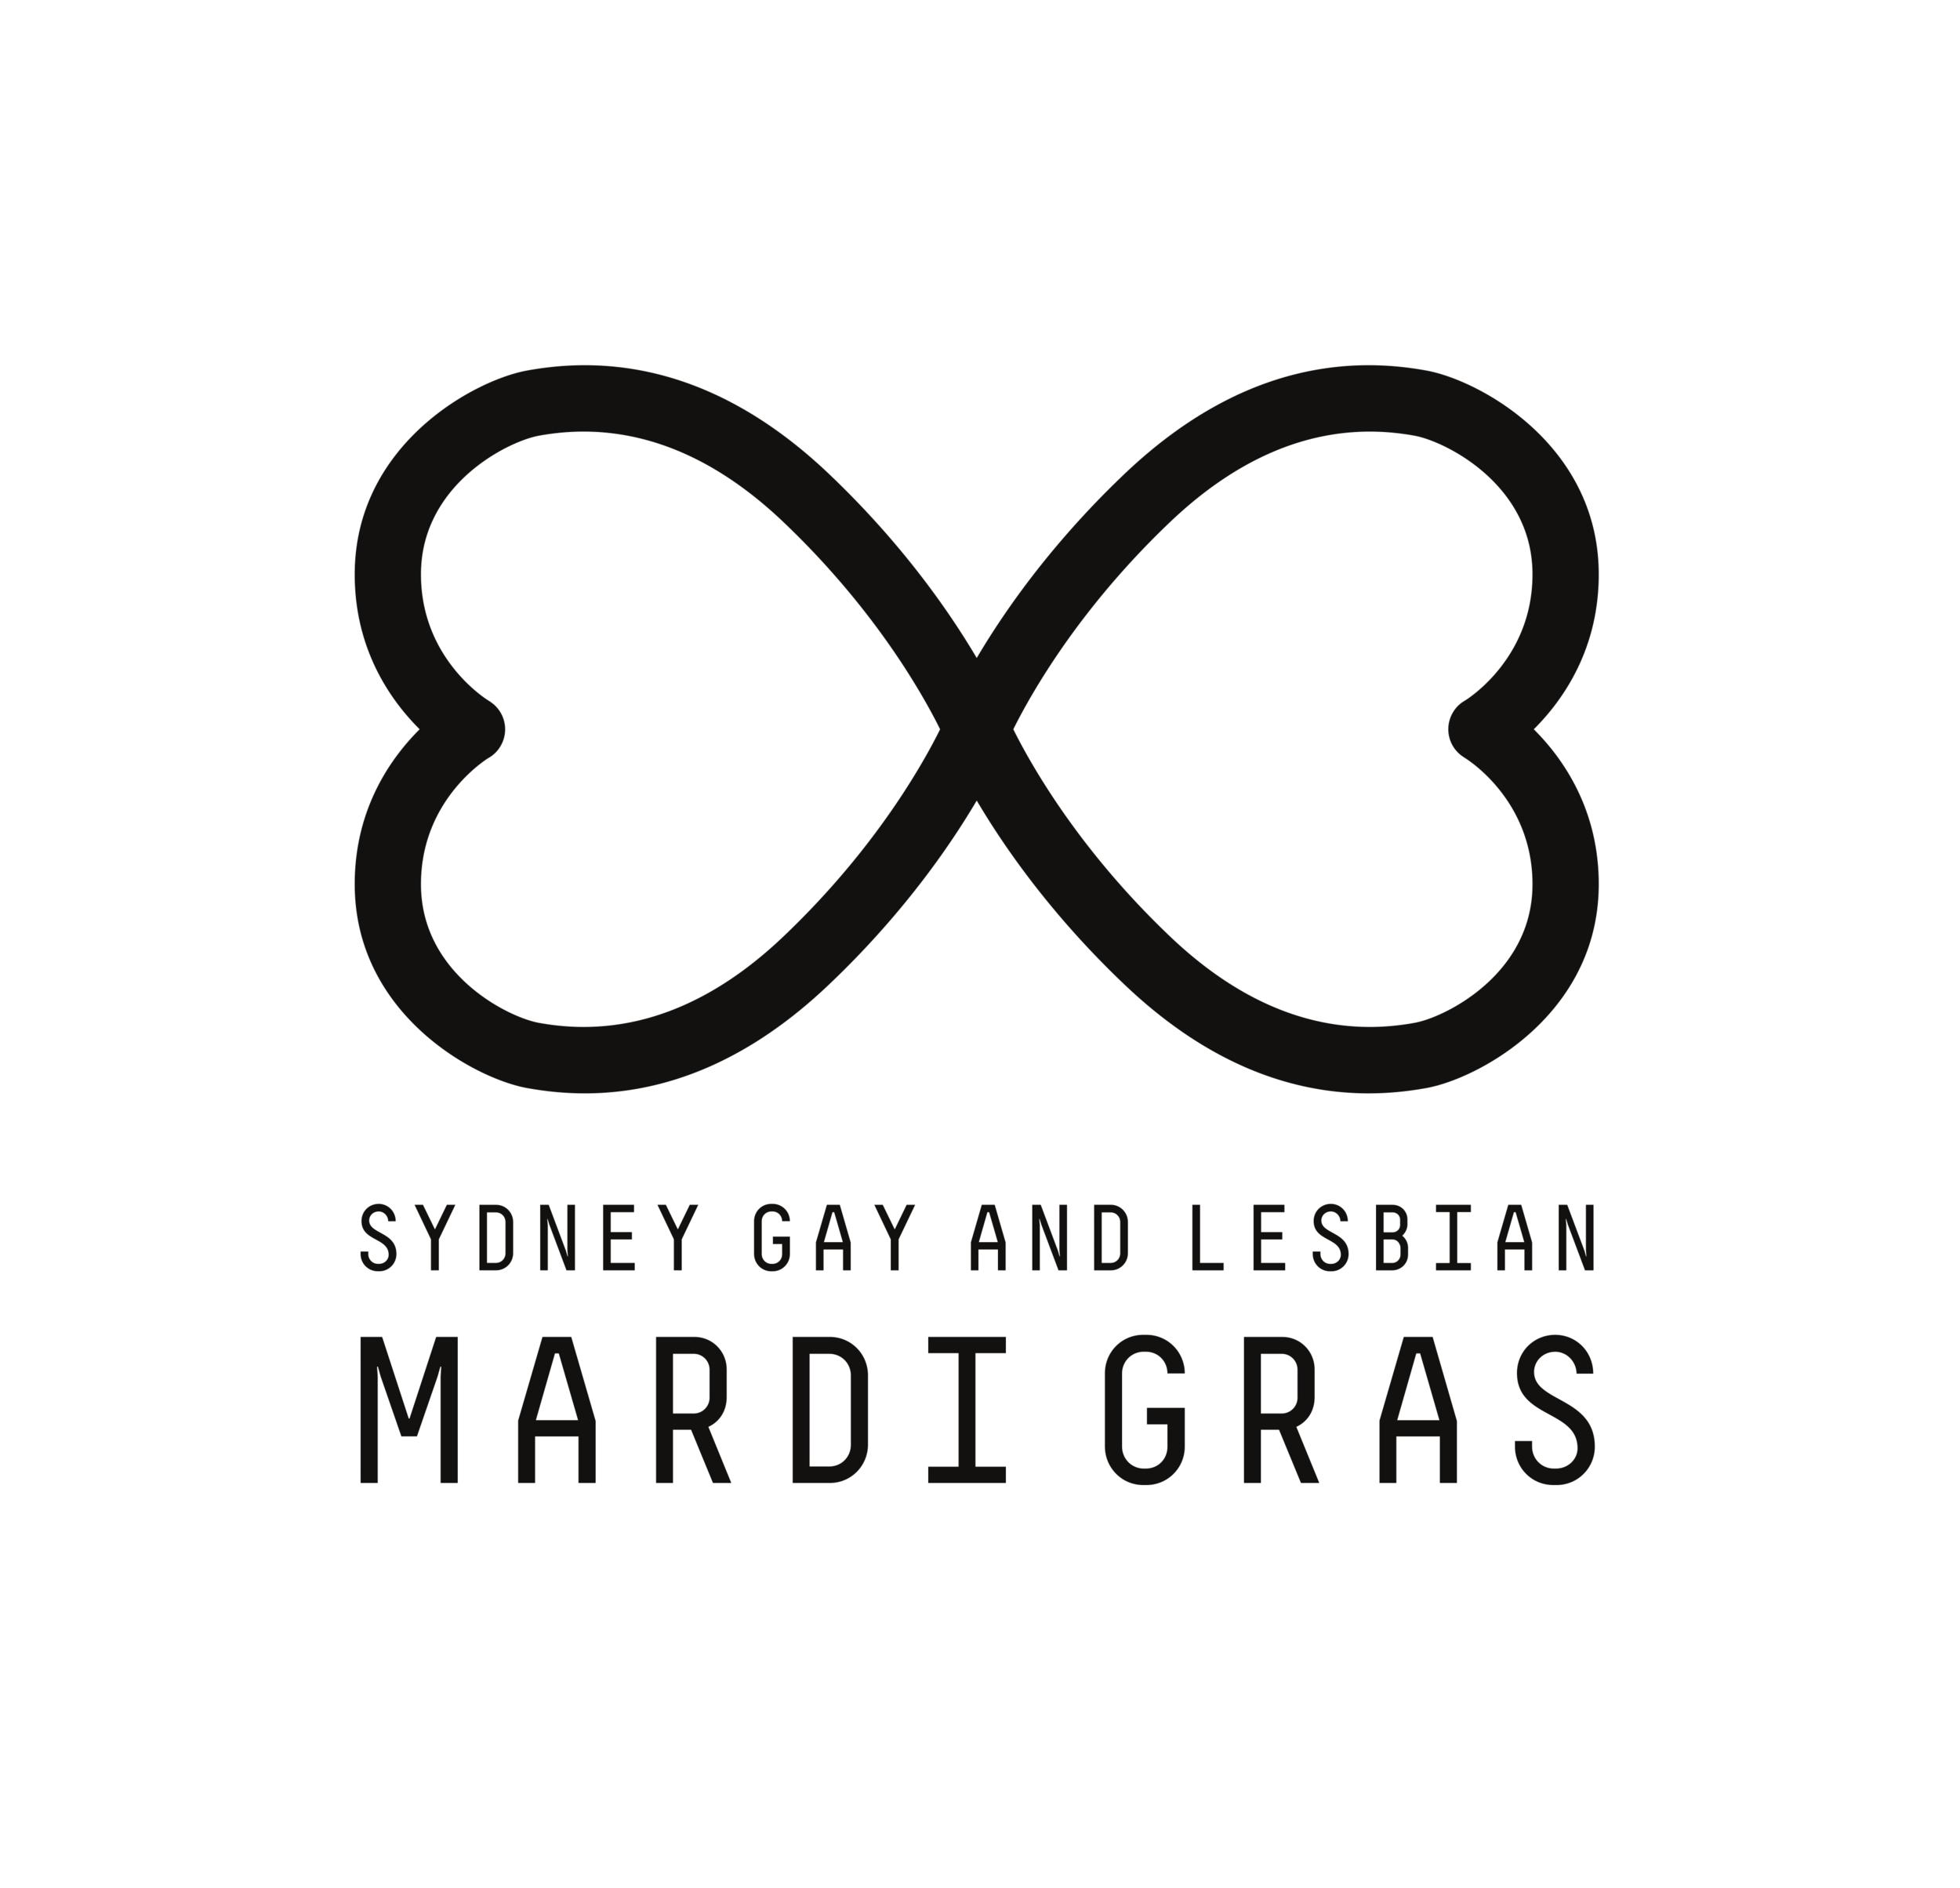 MardiGras_Event-LU01_Print_Primary_MONO.png